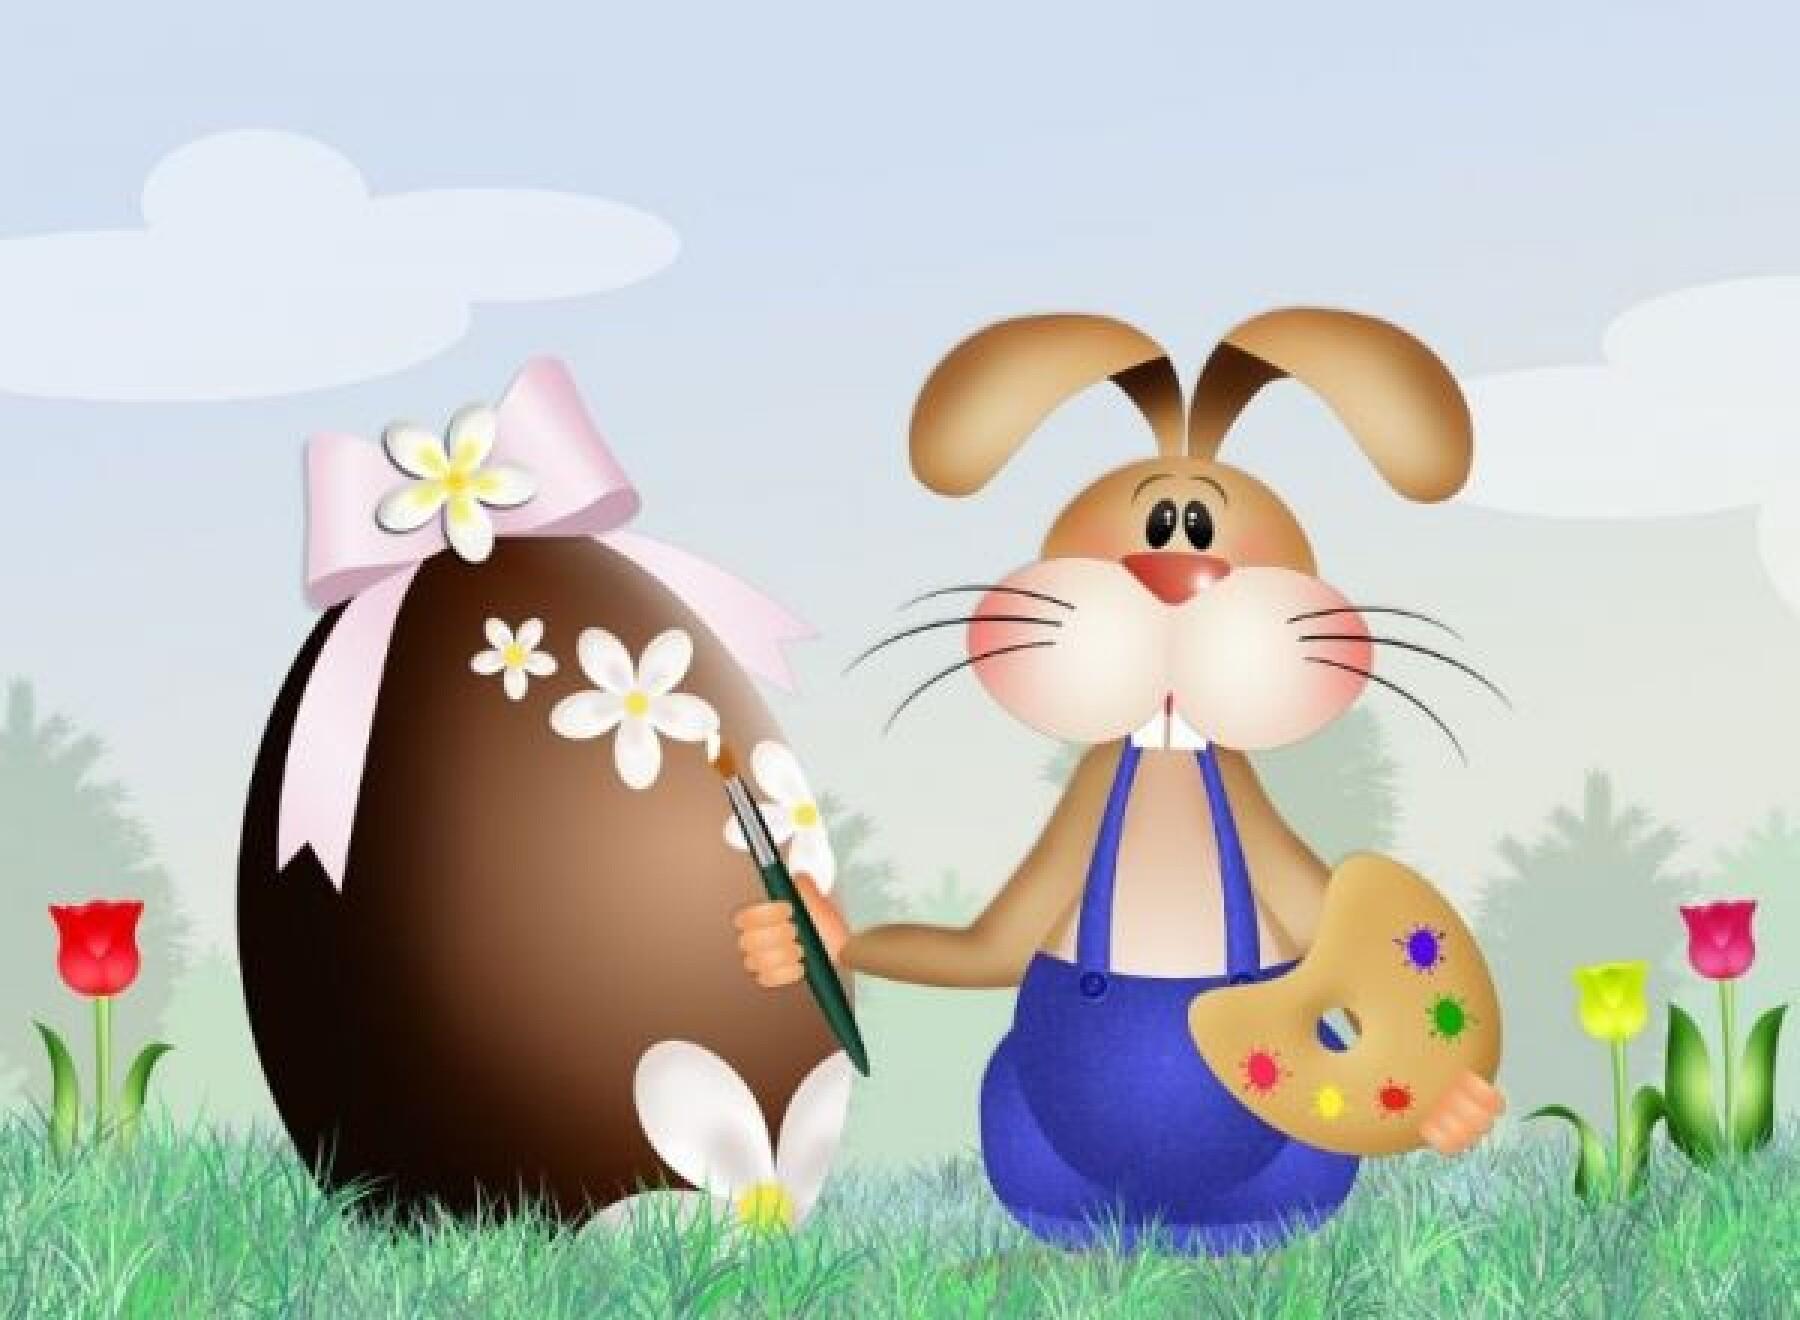 jeu différence lapin peintre Pâques